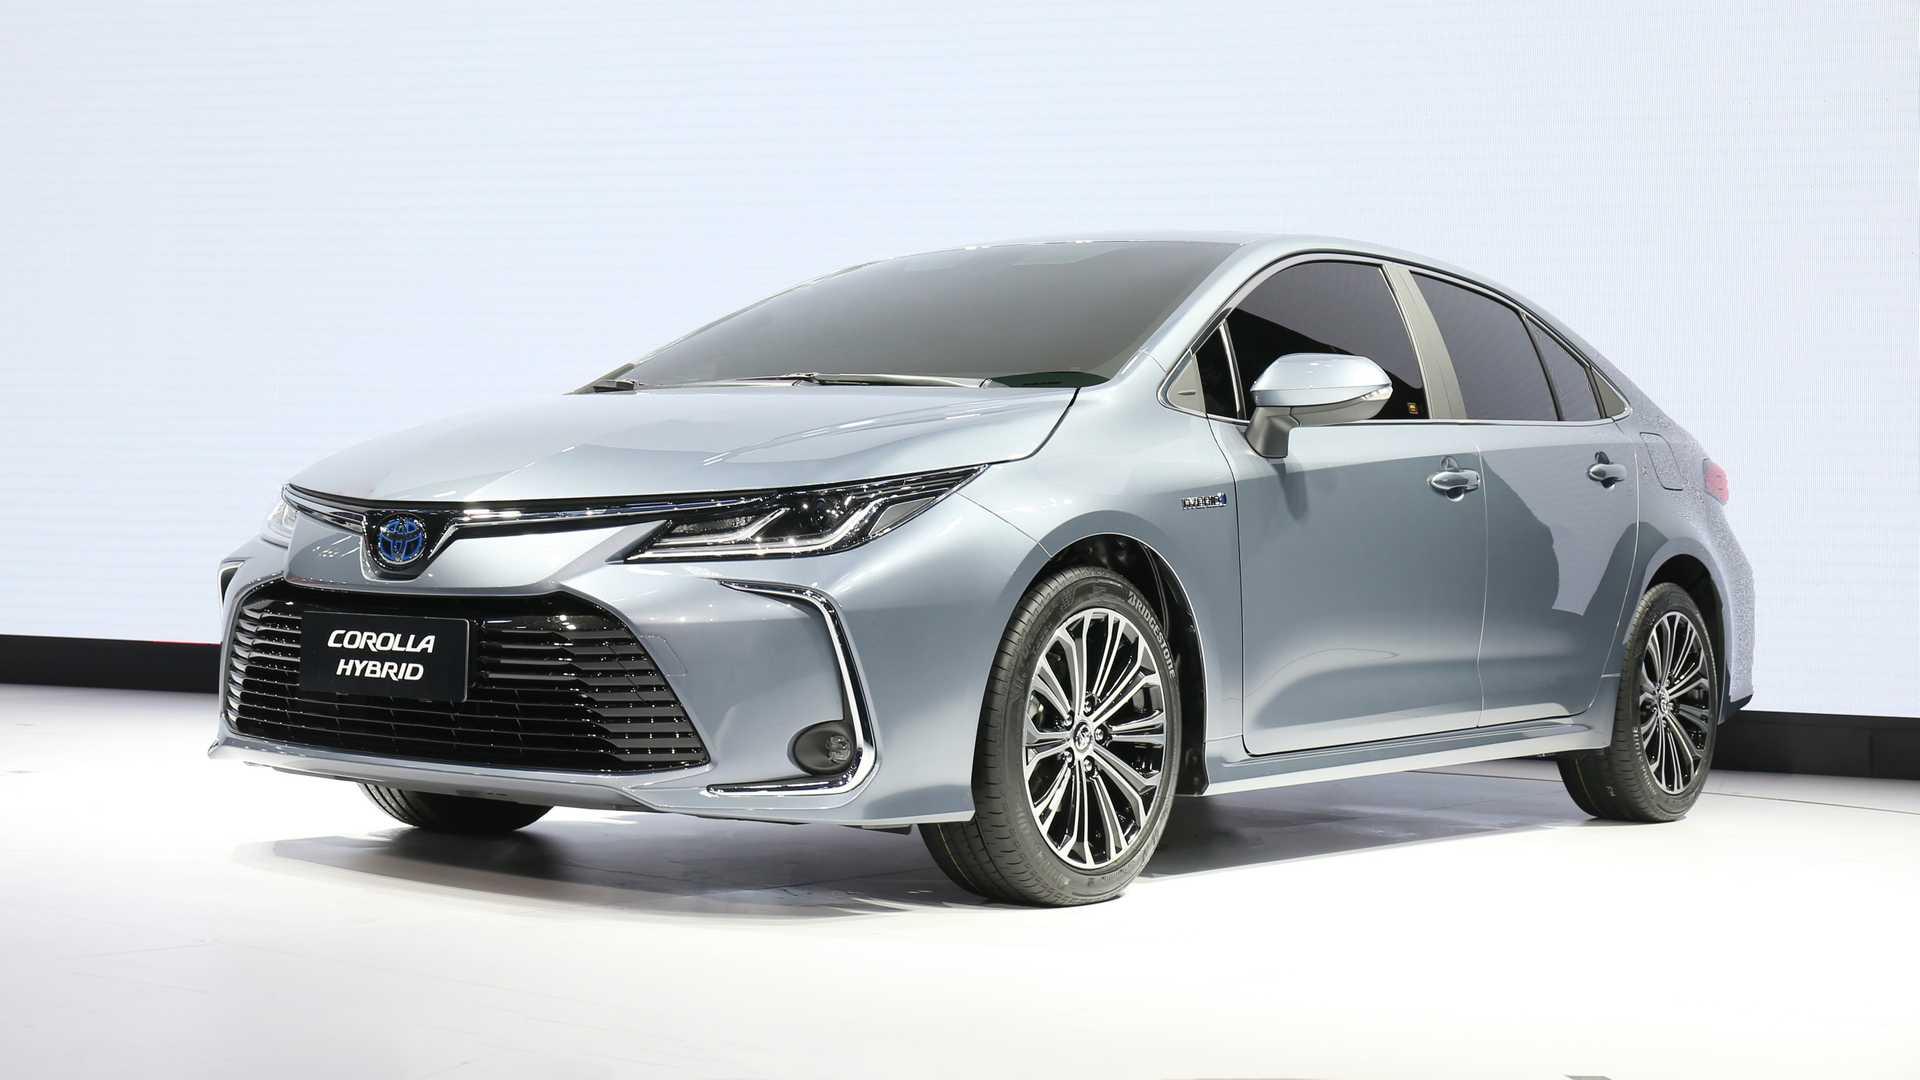 67 Great Toyota En 2020 Overview for Toyota En 2020